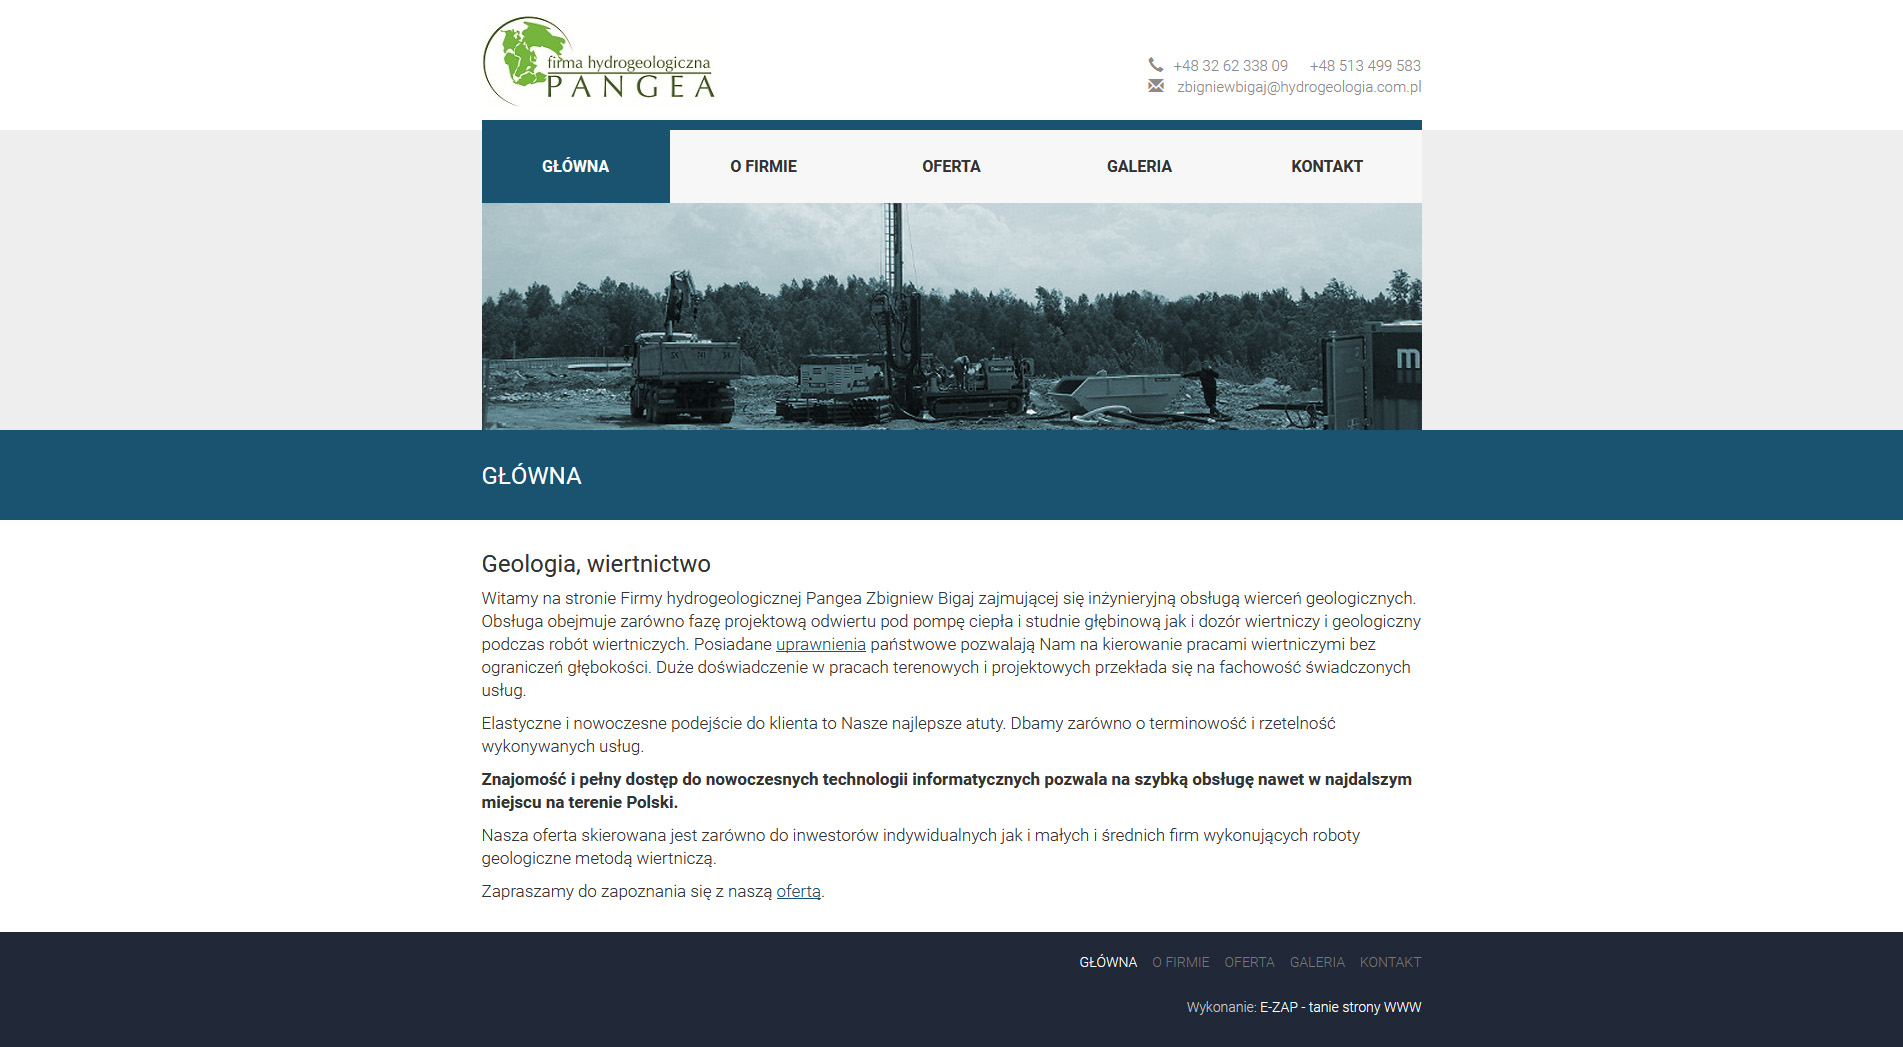 Pangea - firma hydrogeologiczna